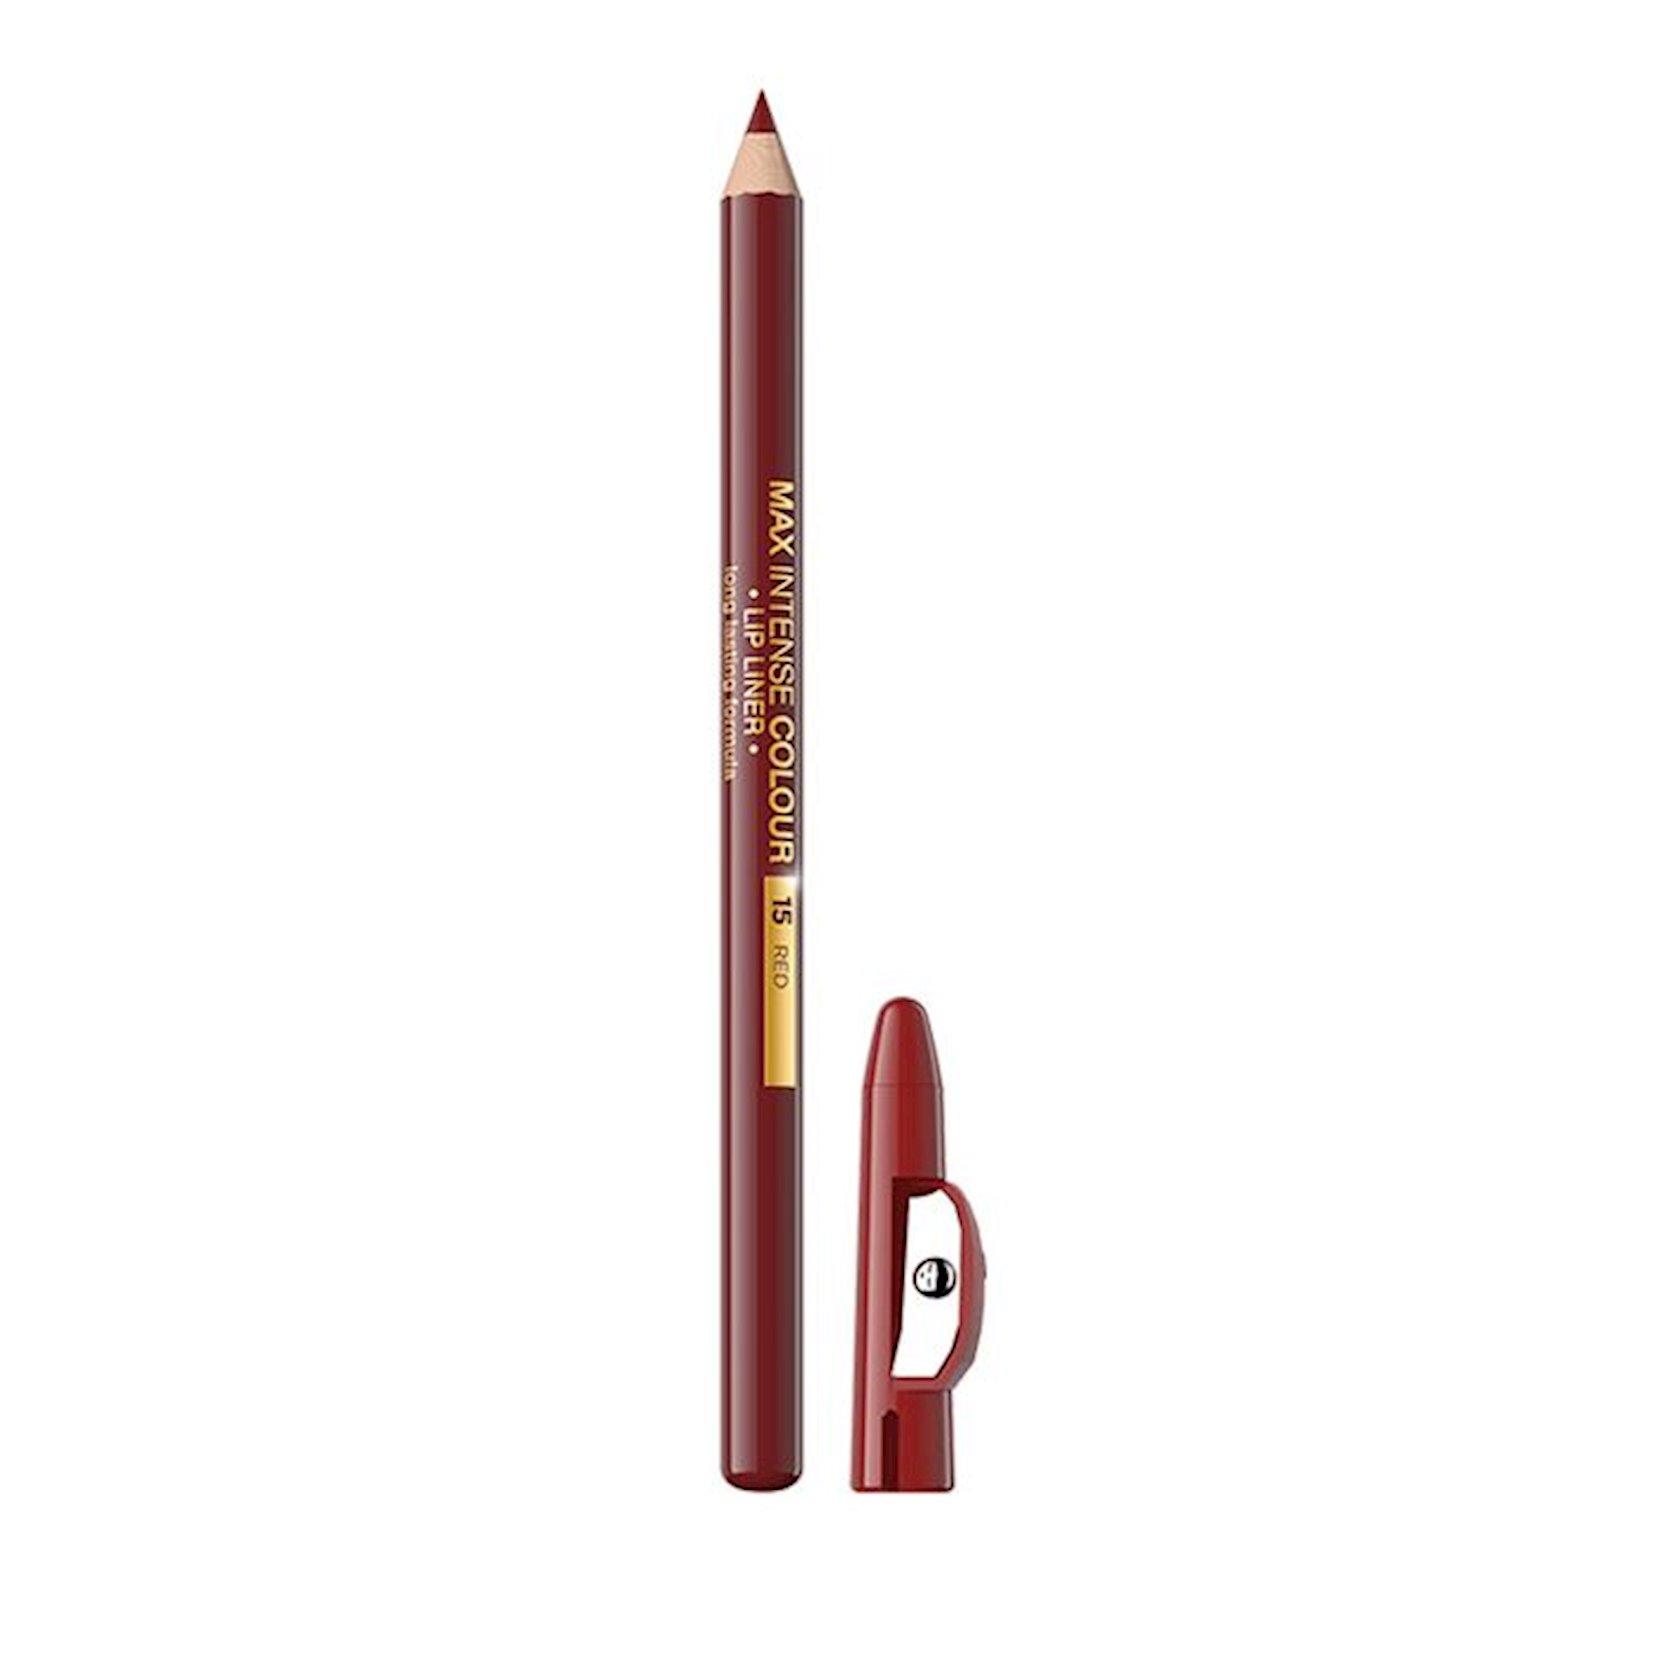 Dodaq layneri Eveline cosmetics Max intense colour 15 Red